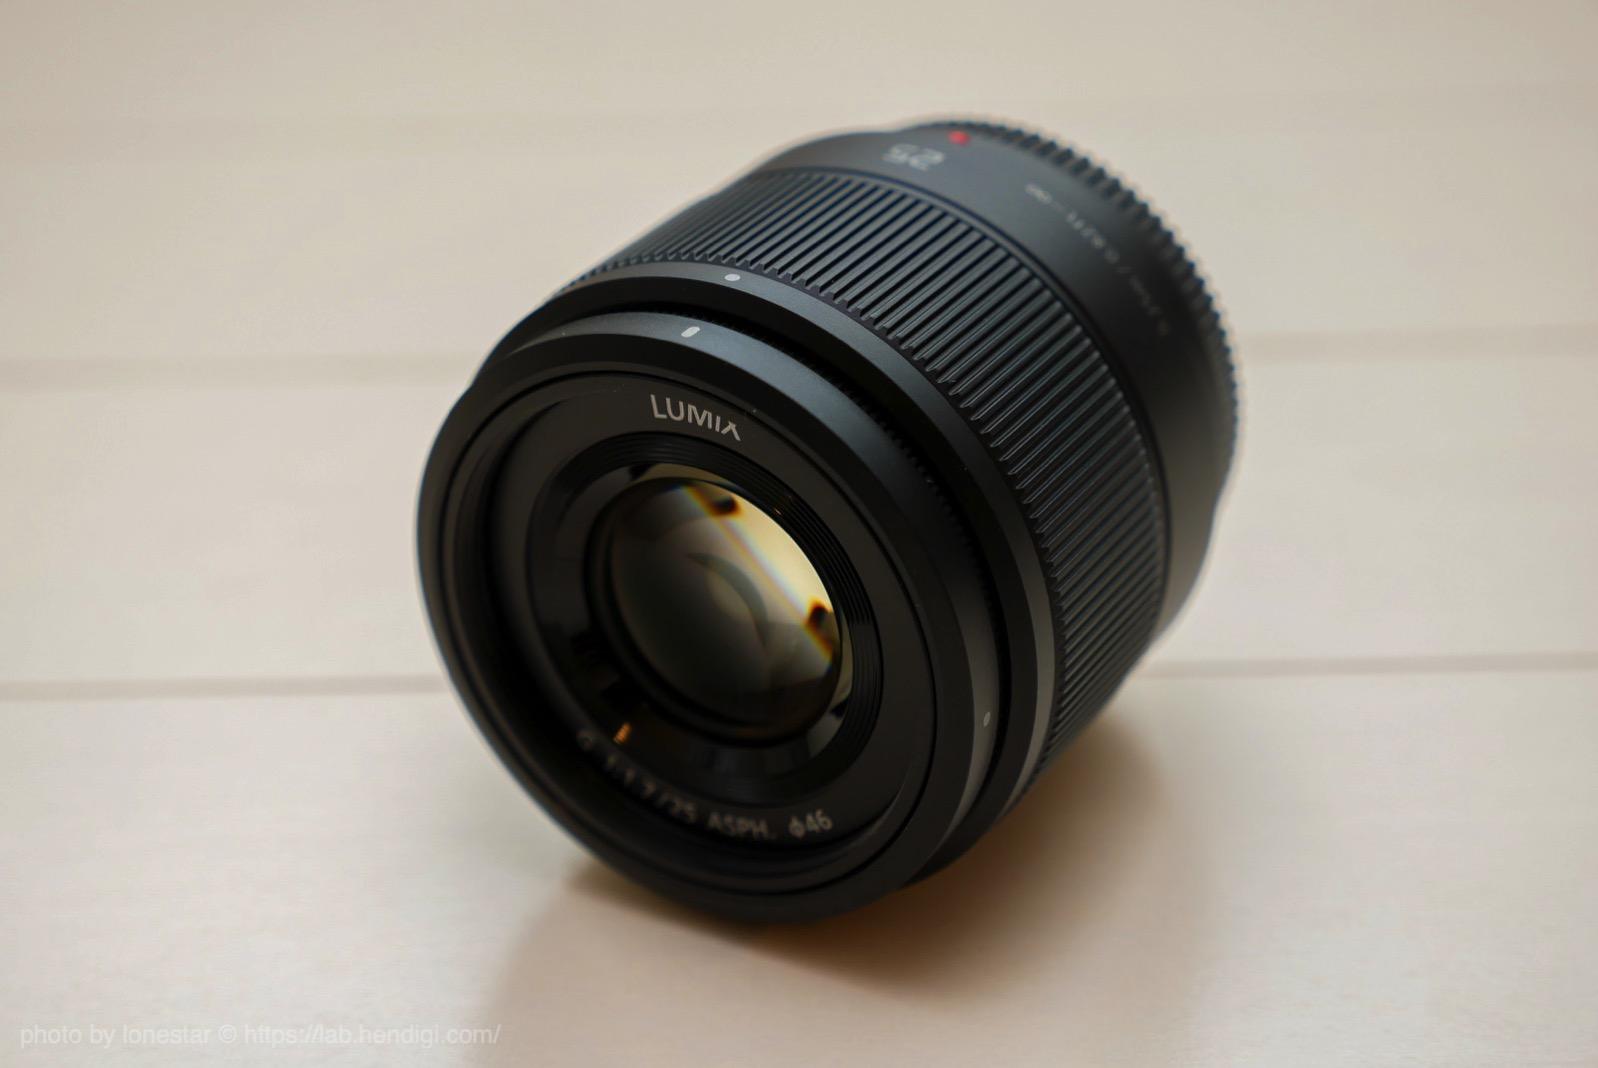 LUMIX G 25mm F1.7